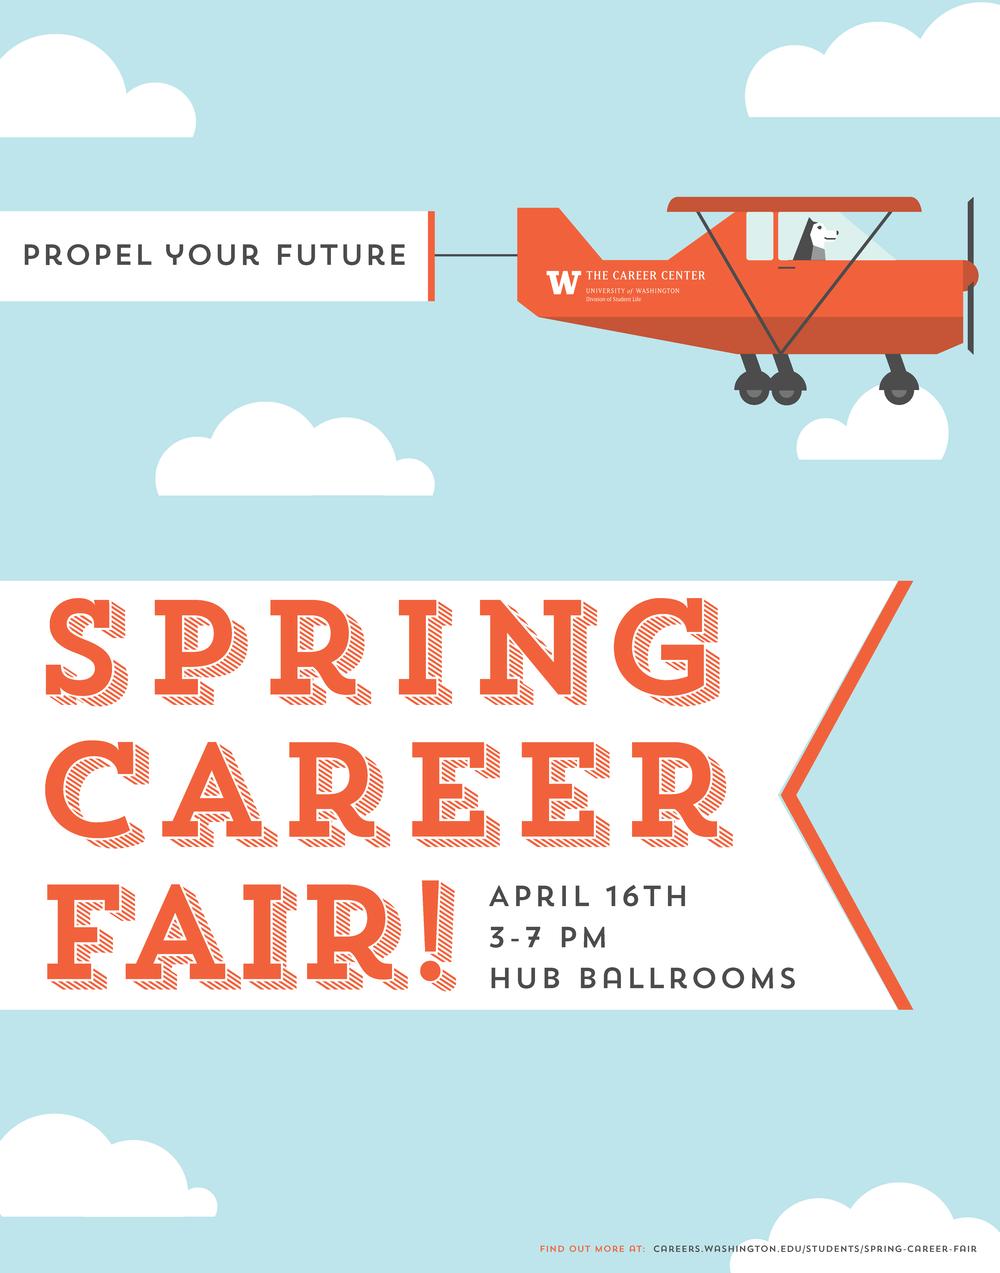 Spring Career Fair Poster Job fair, Career counseling